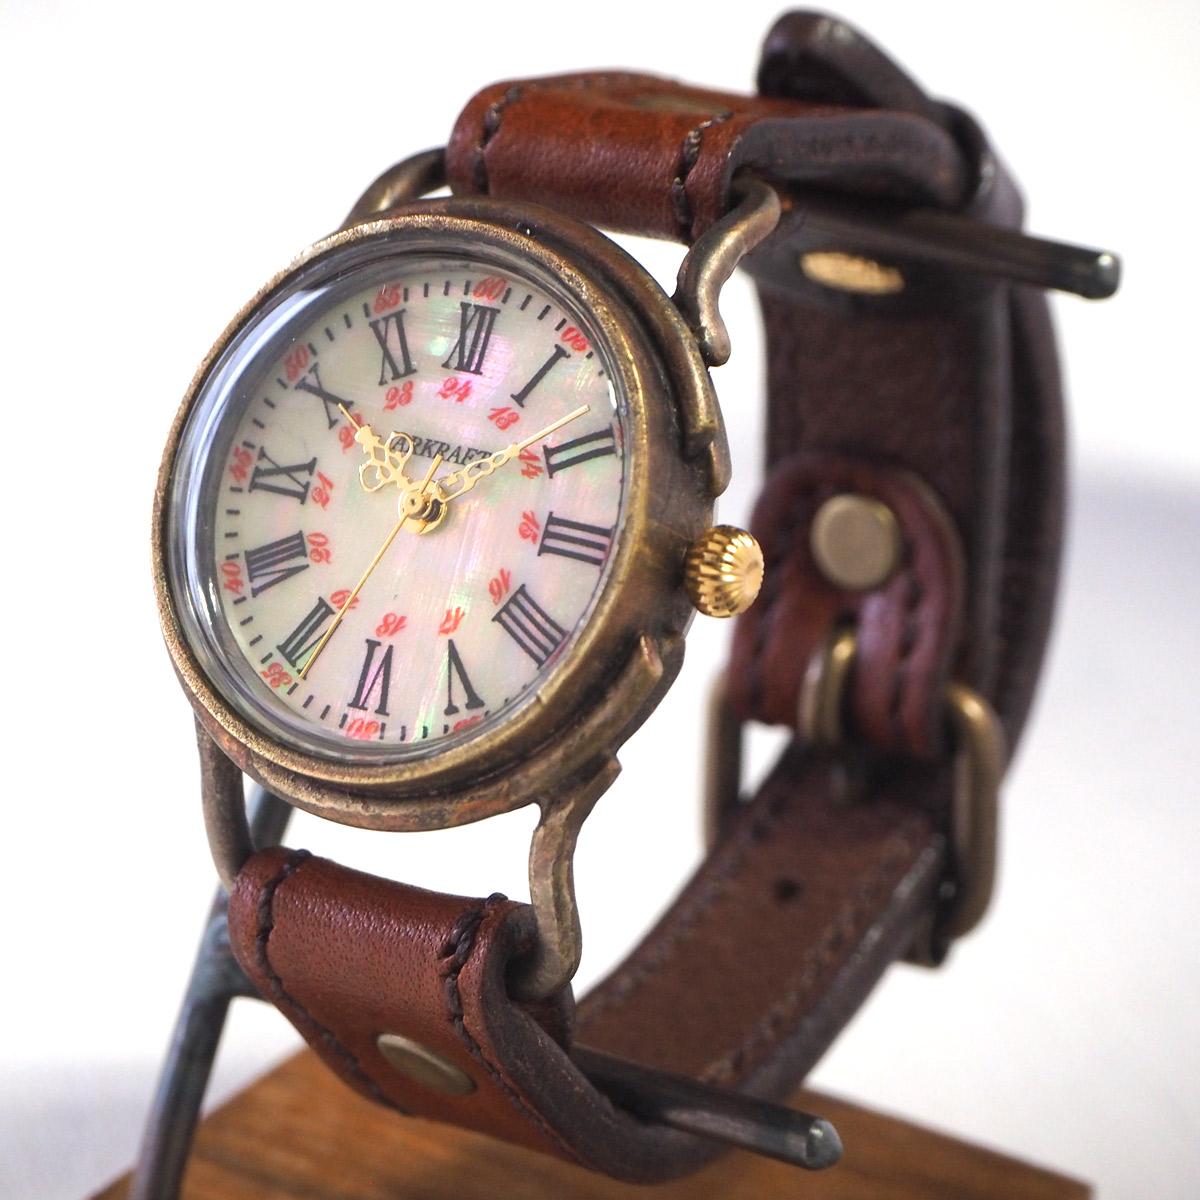 "ARKRAFT(アークラフト) 時計作家・新木秀和 手作り腕時計 ""Drake Medium"" シェル文字盤 赤ドット プレミアムストラップ [AR-C-020-BL-RD]"